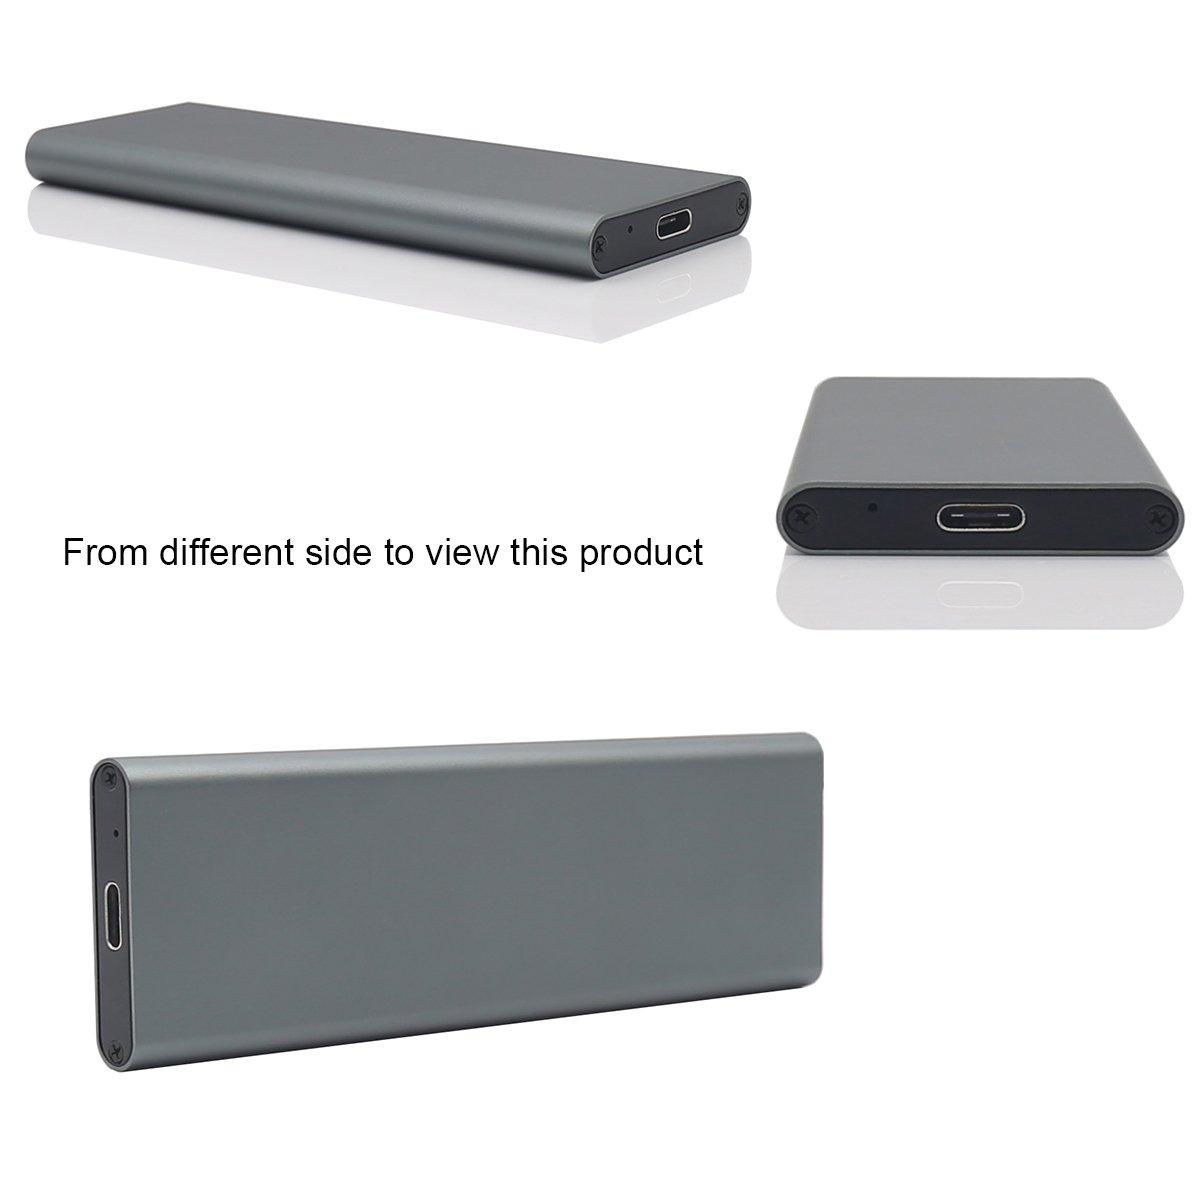 Aluminum M.2 NGFF to USB 3.1 M.2 SSD Enclosure External SSD Enclosure SATA Based M.2(Grey) by Generic (Image #7)